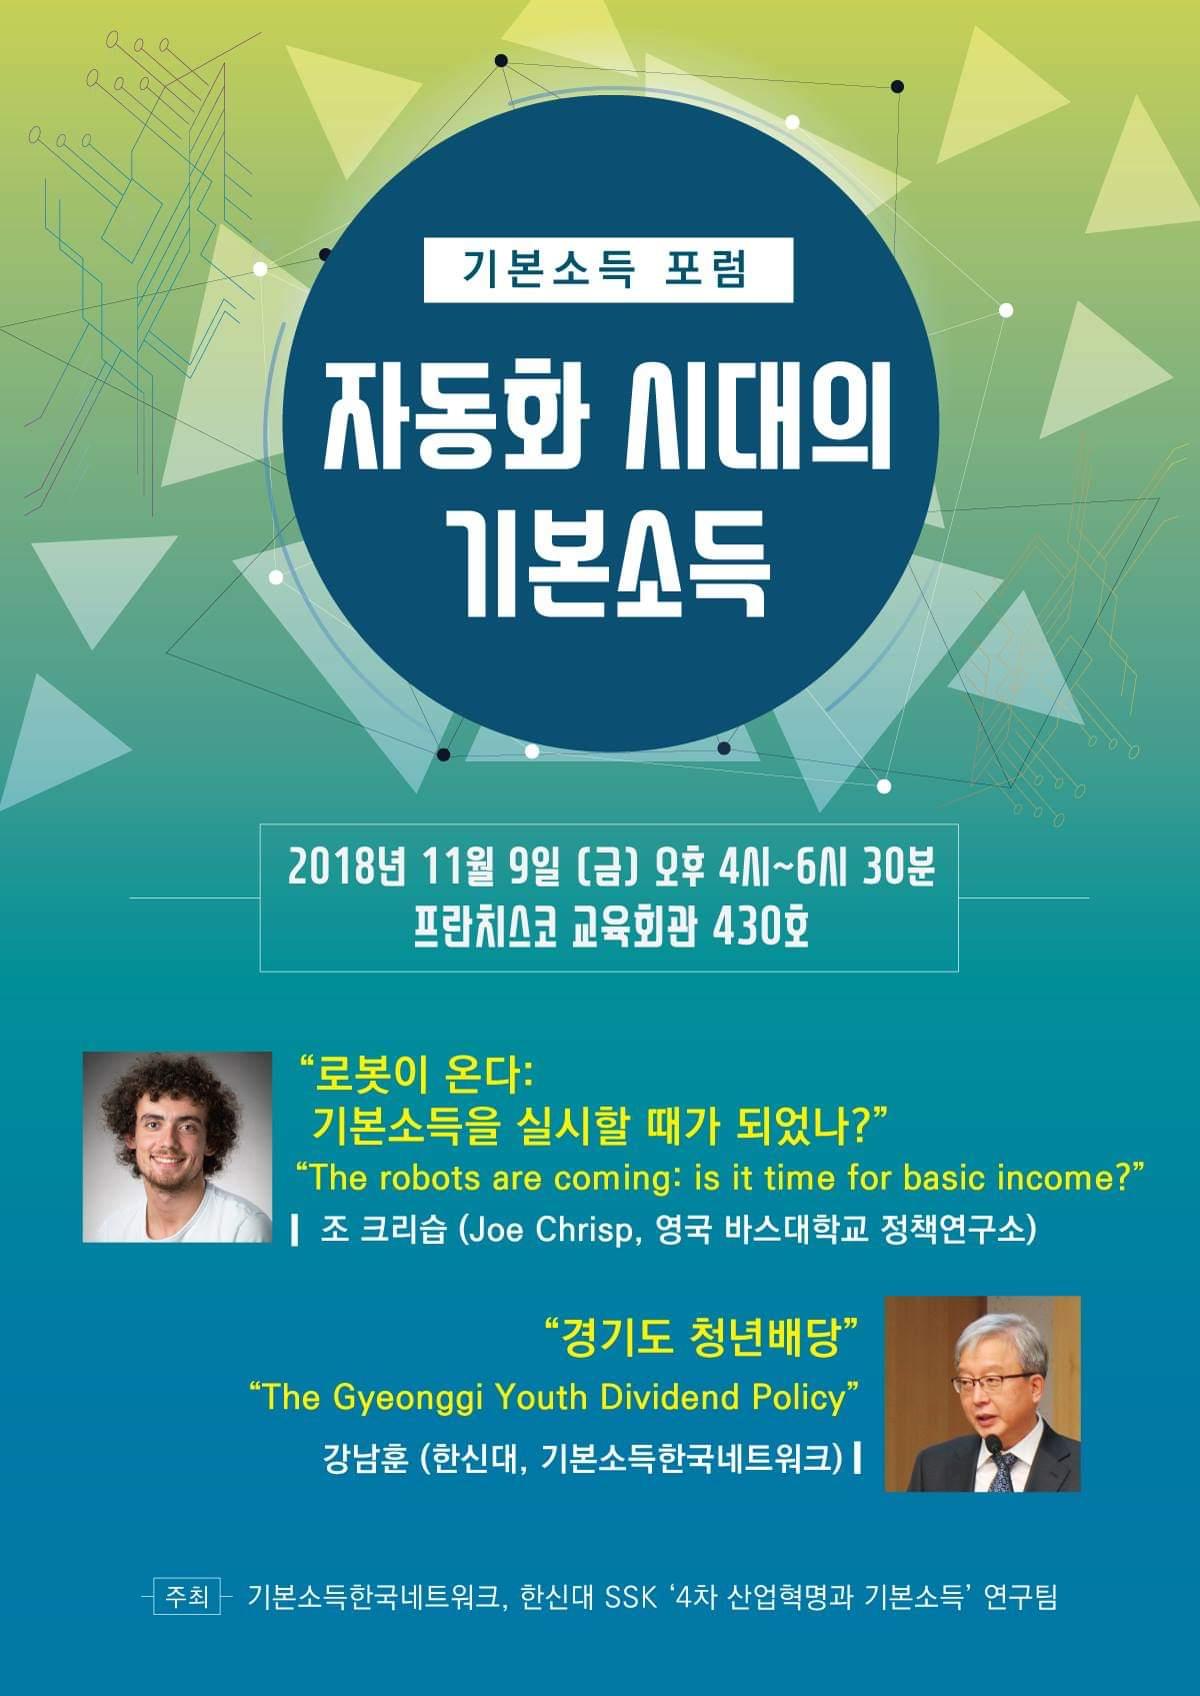 bge-Termin in Seoul